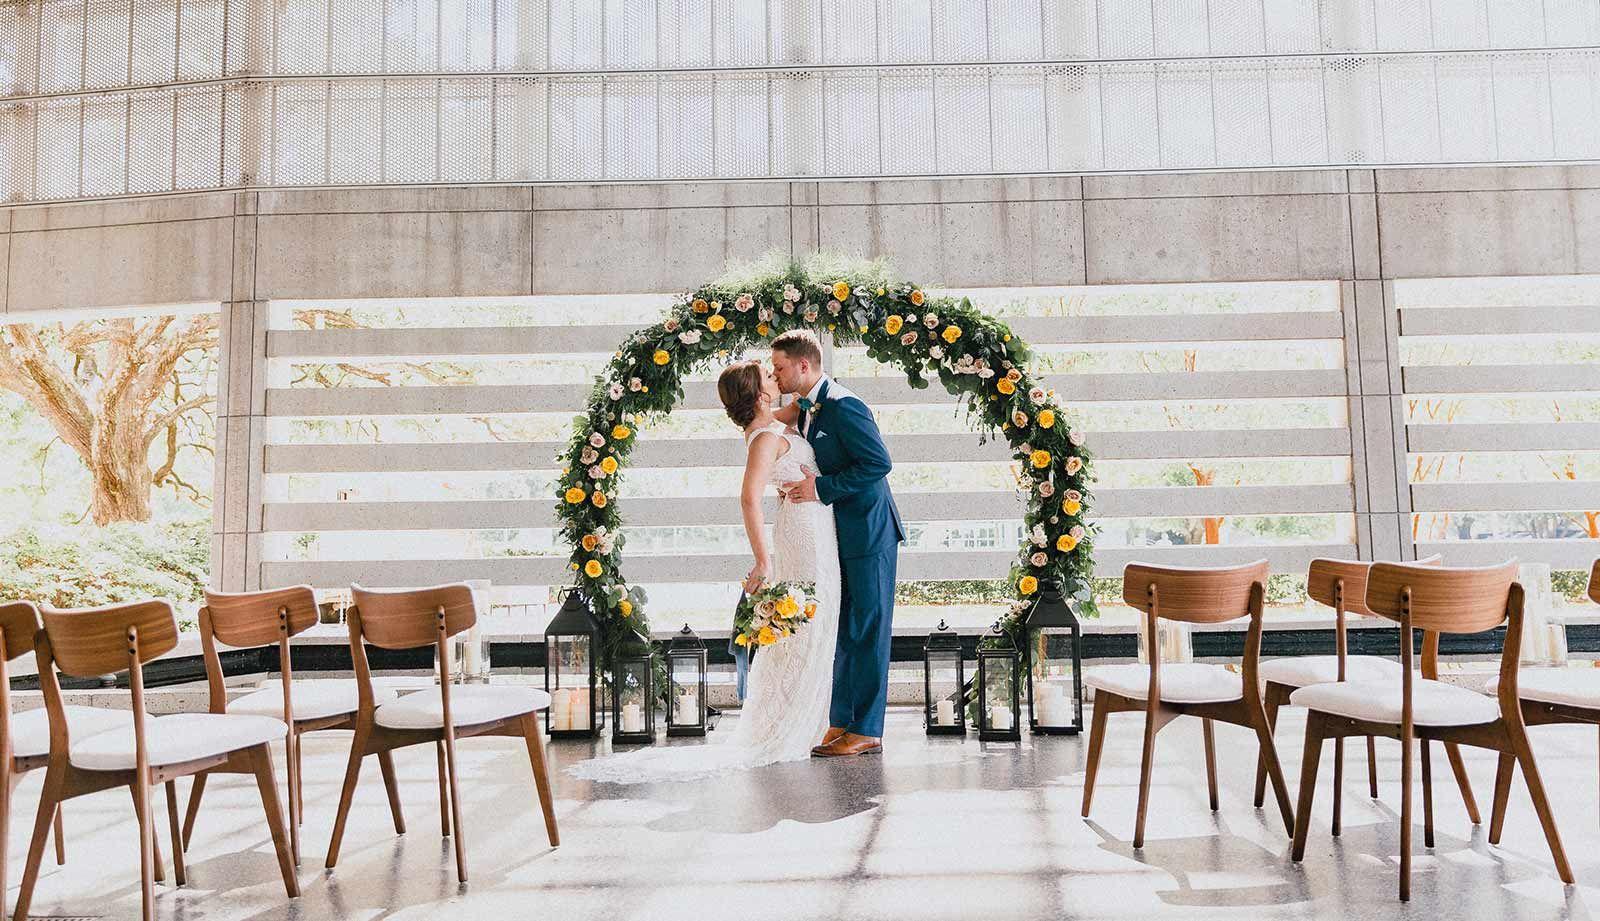 Wedding Event Rentals For Baton Rouge New Orleans Event Design In 2020 Event Rental Business Wedding Rentals Event Rental